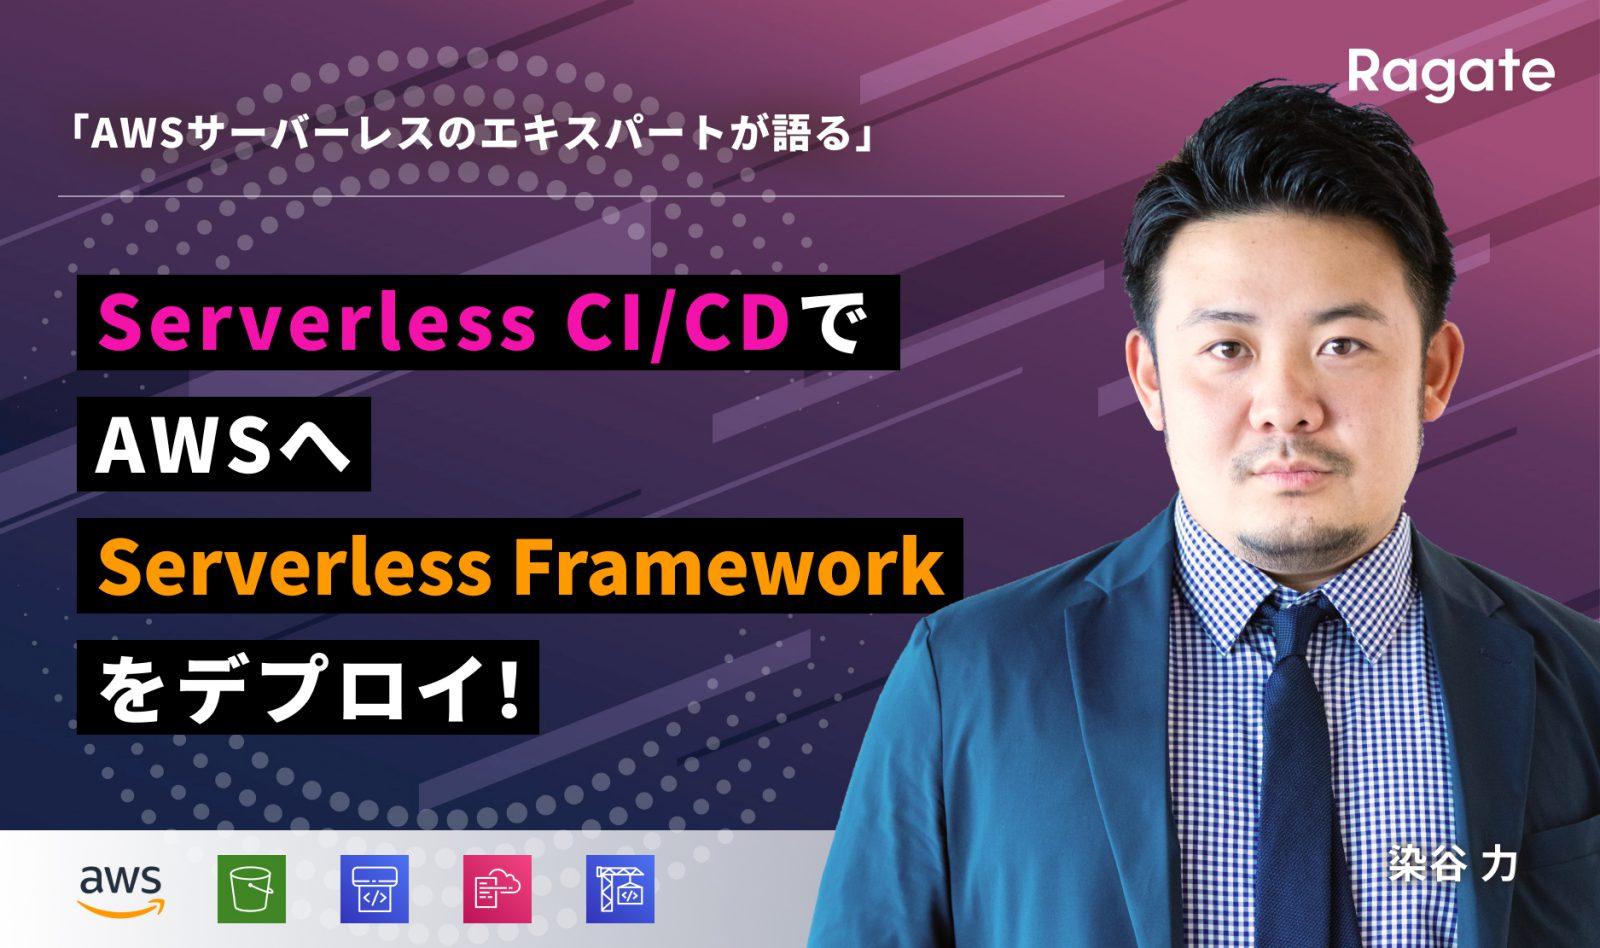 Serverless CI/CD でAWSへServerless Frameworkをデプロイ!